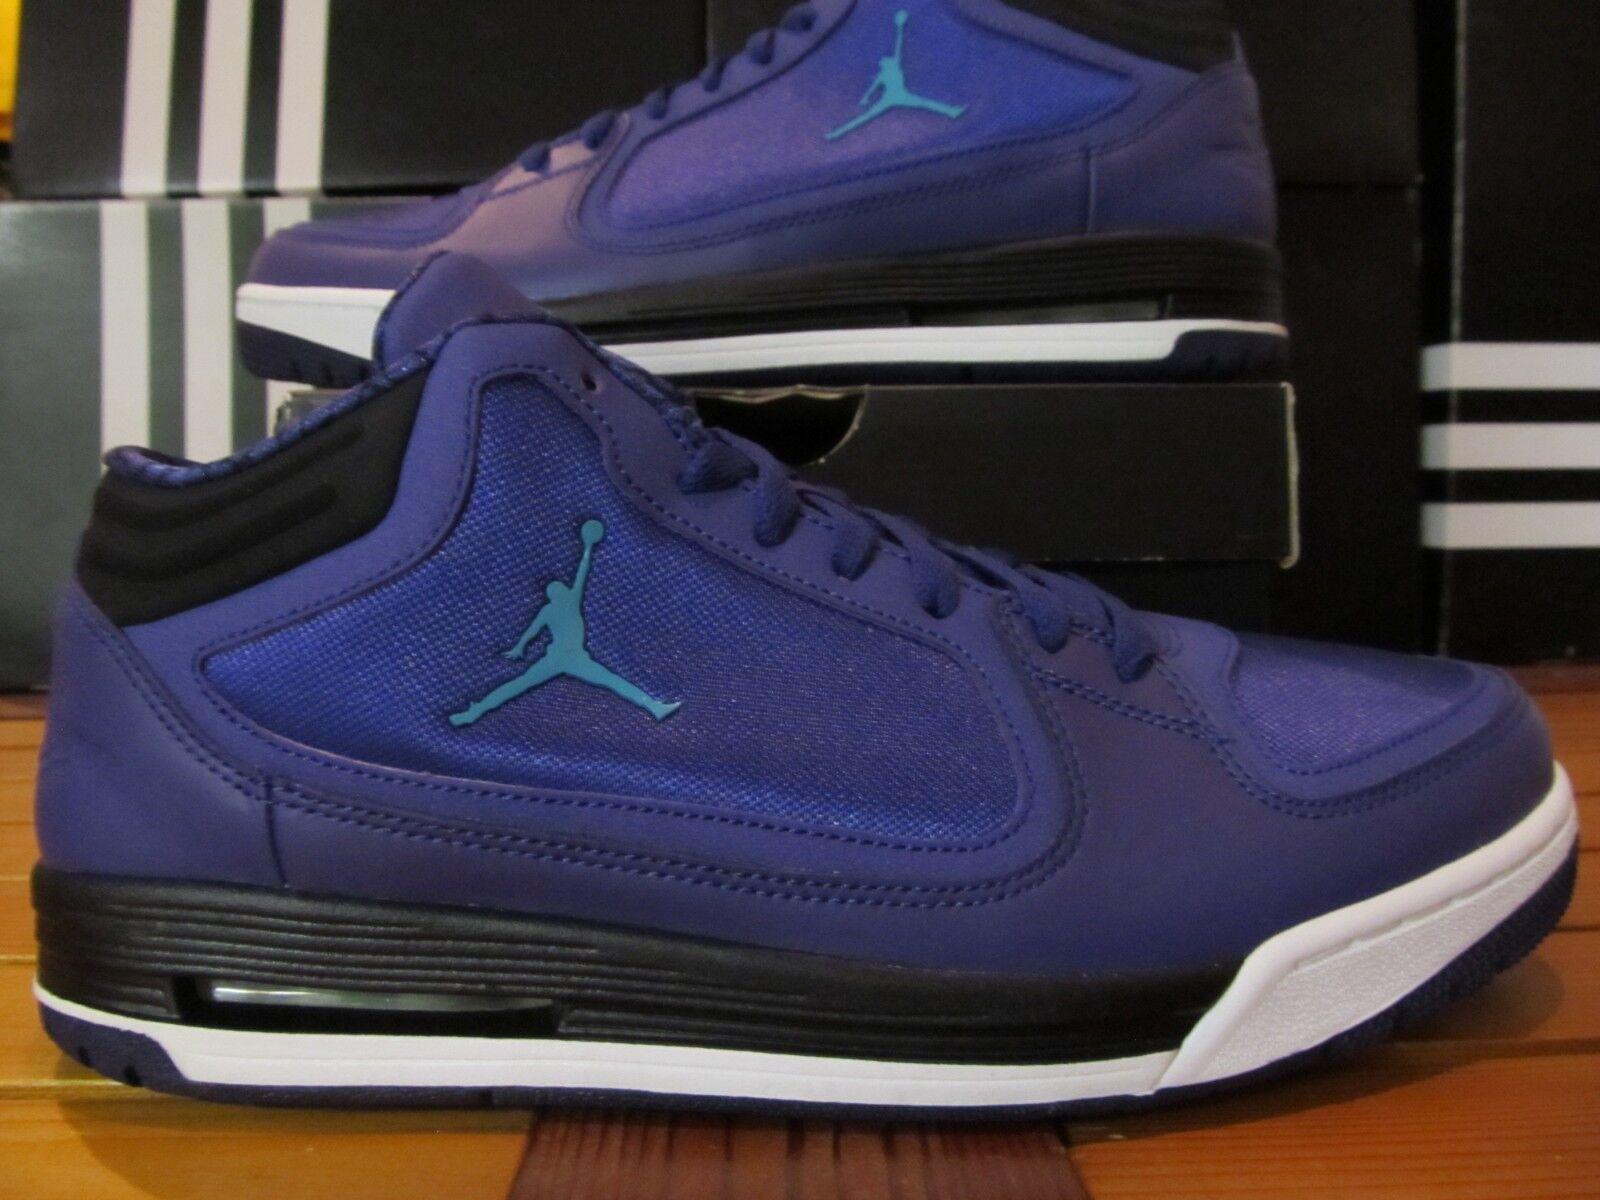 DS Nike Air Jordan Post Game Grape Ice Emerald Blk 10.5 552665 593 retro aqua 8